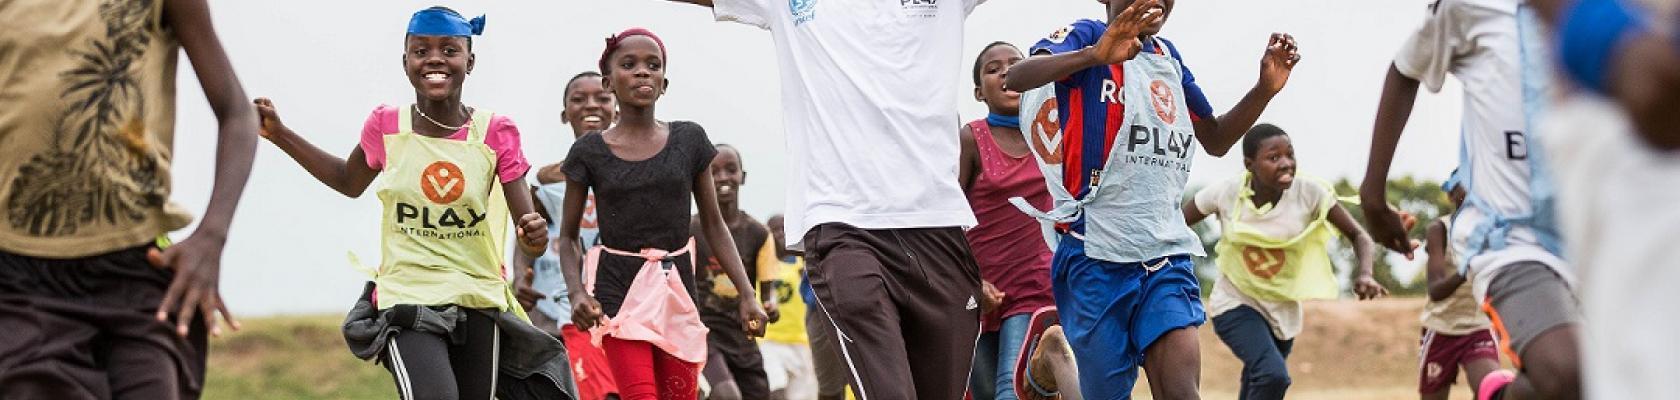 Une session de playdagogie par Play International au Burundi